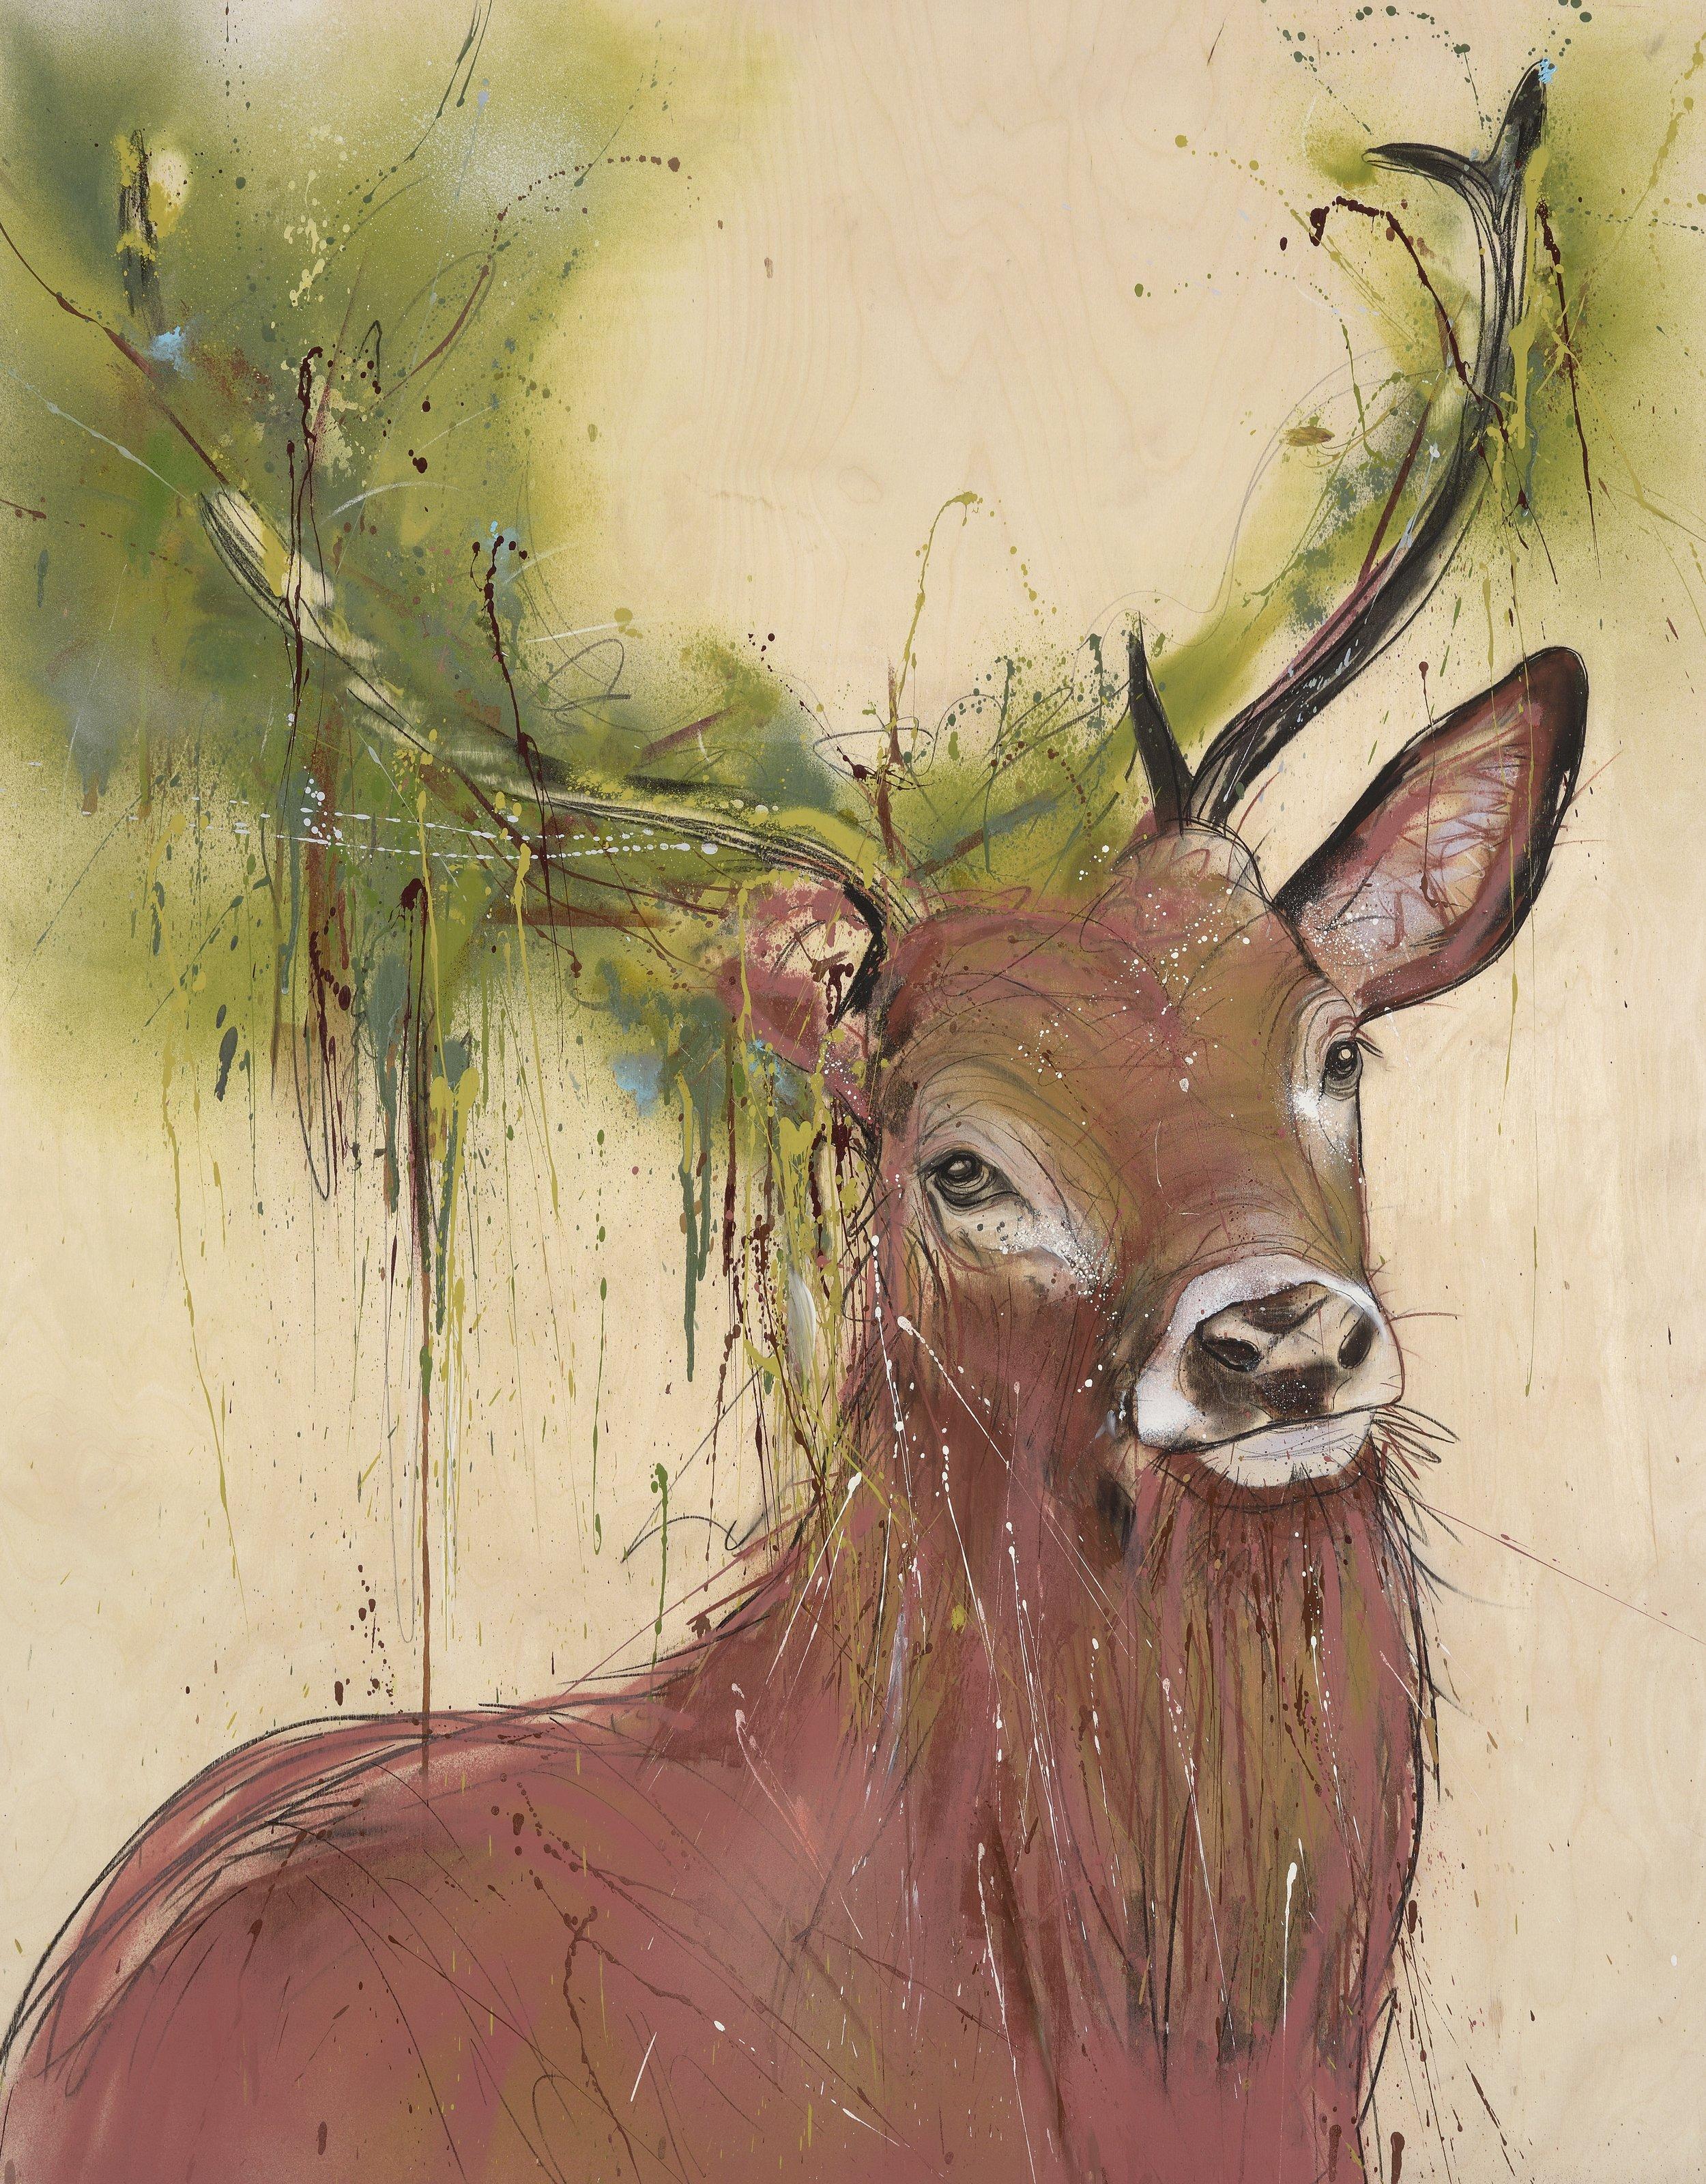 King Henry's Stag I , Original spray paint & conté on birch ply, 120 x 95cm